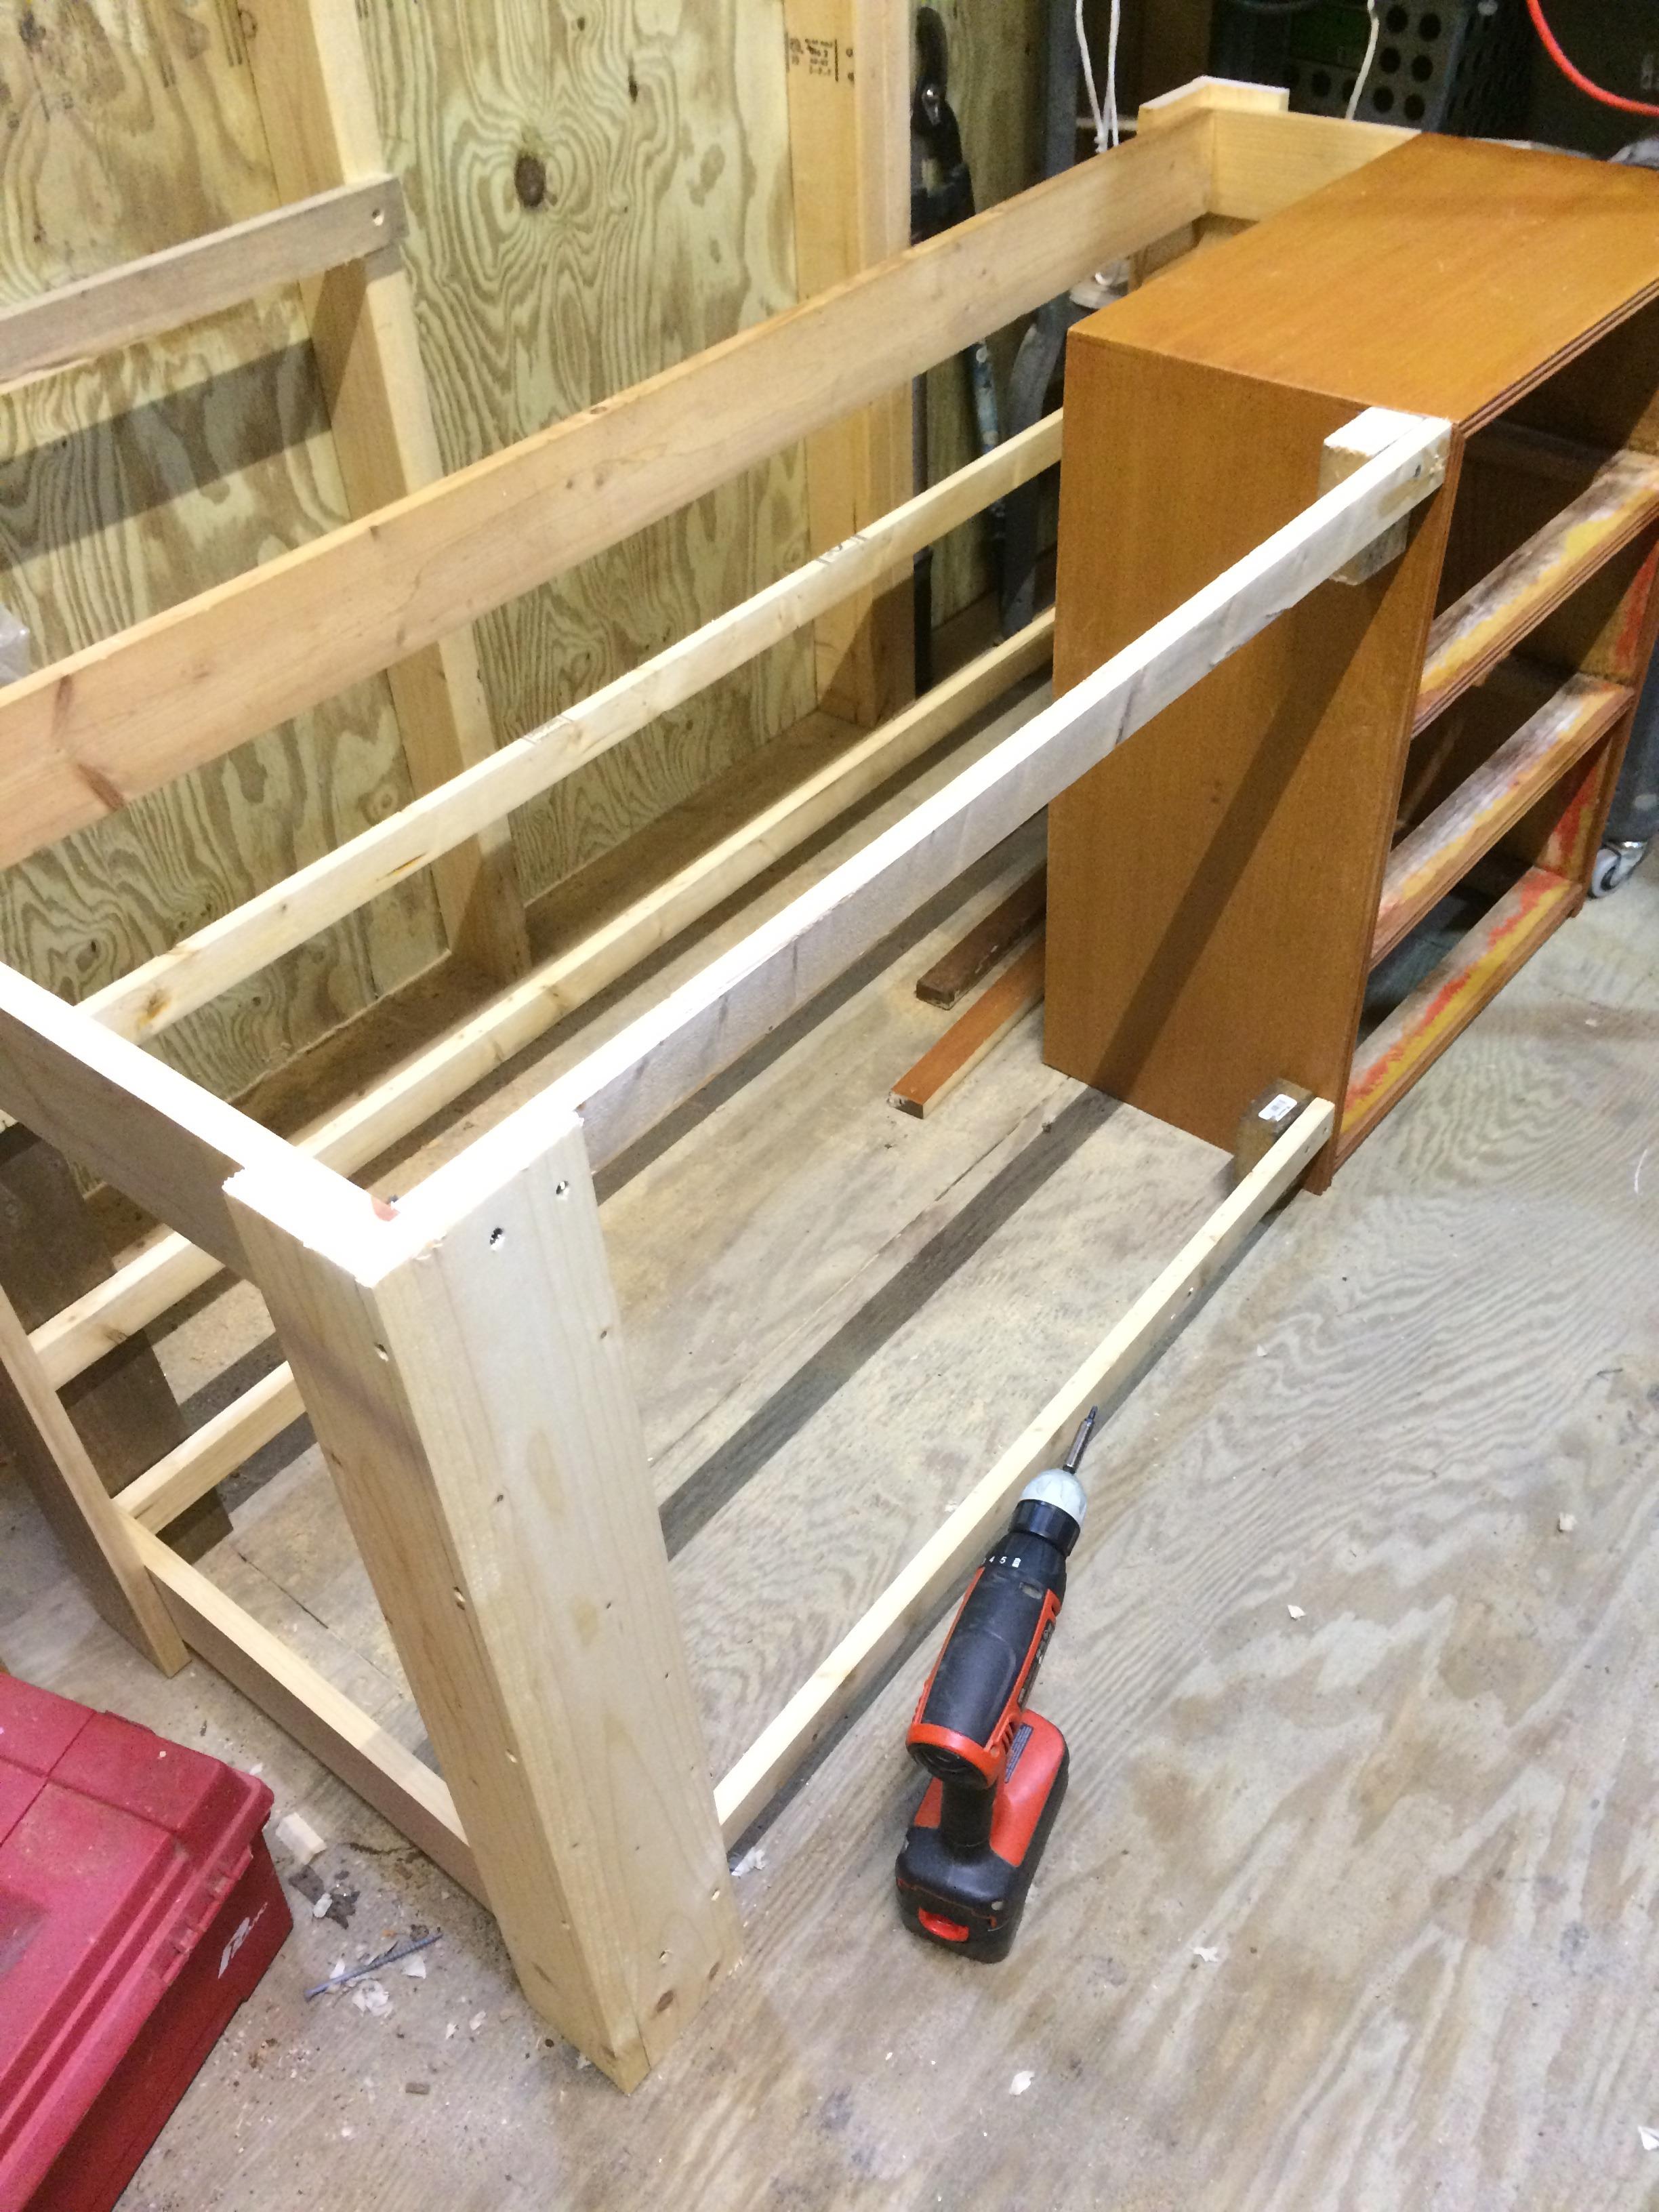 Picture of Build, Build, Build